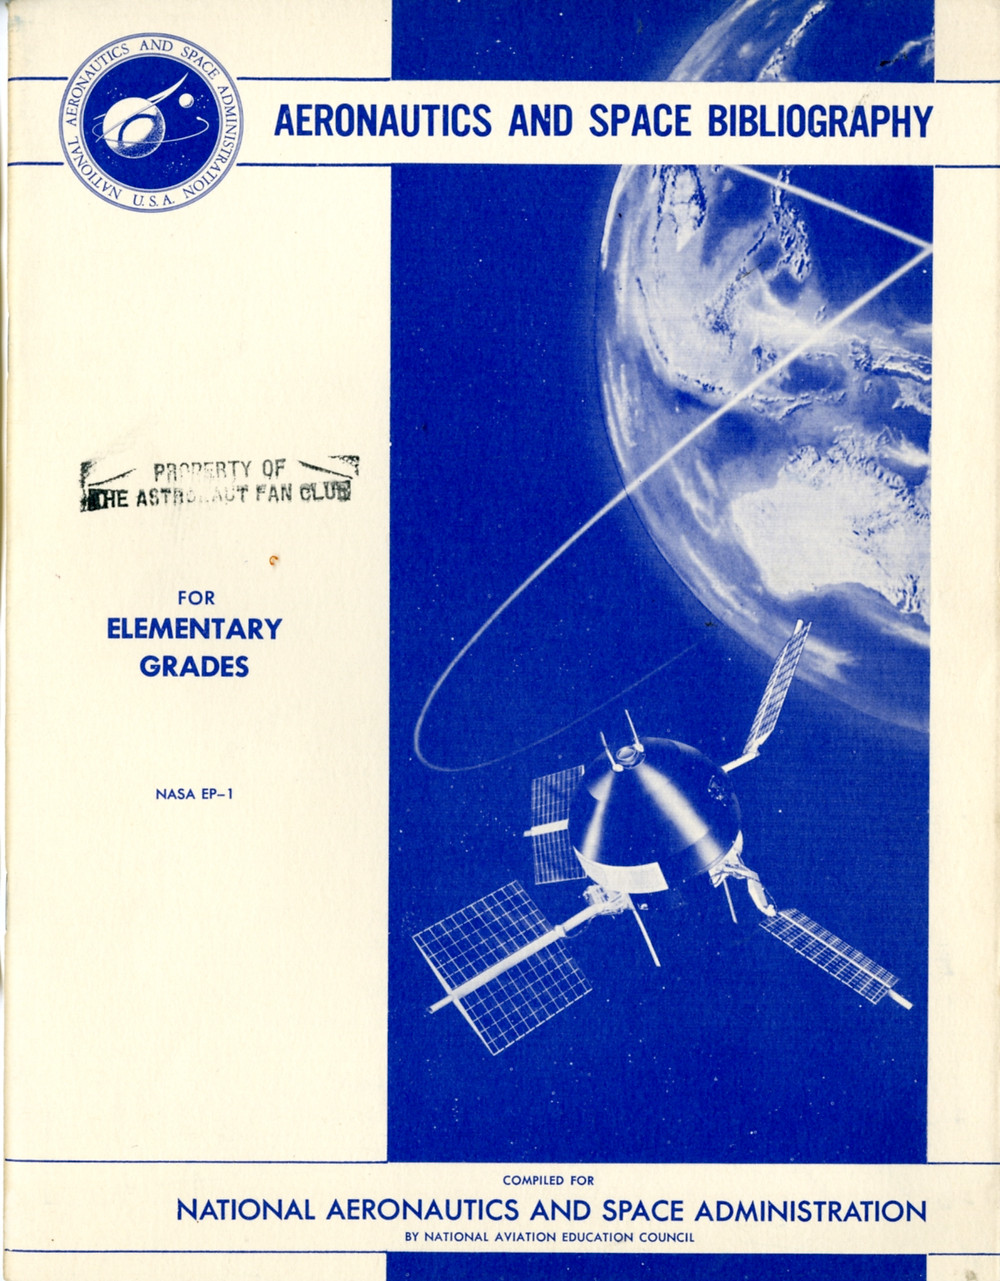 Aeronautics and space bibliography